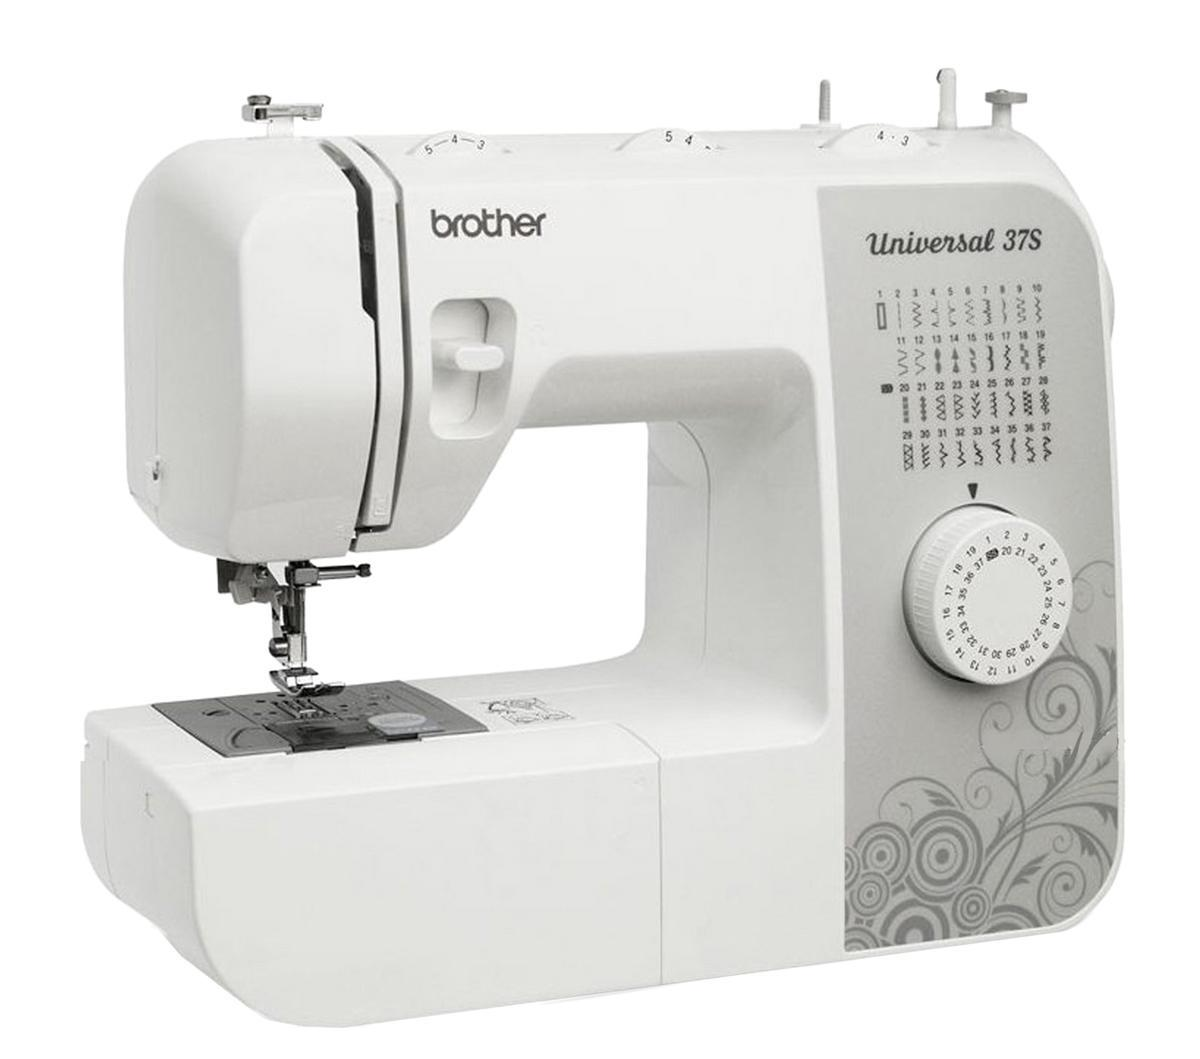 Brother Universal 37S швейная машина